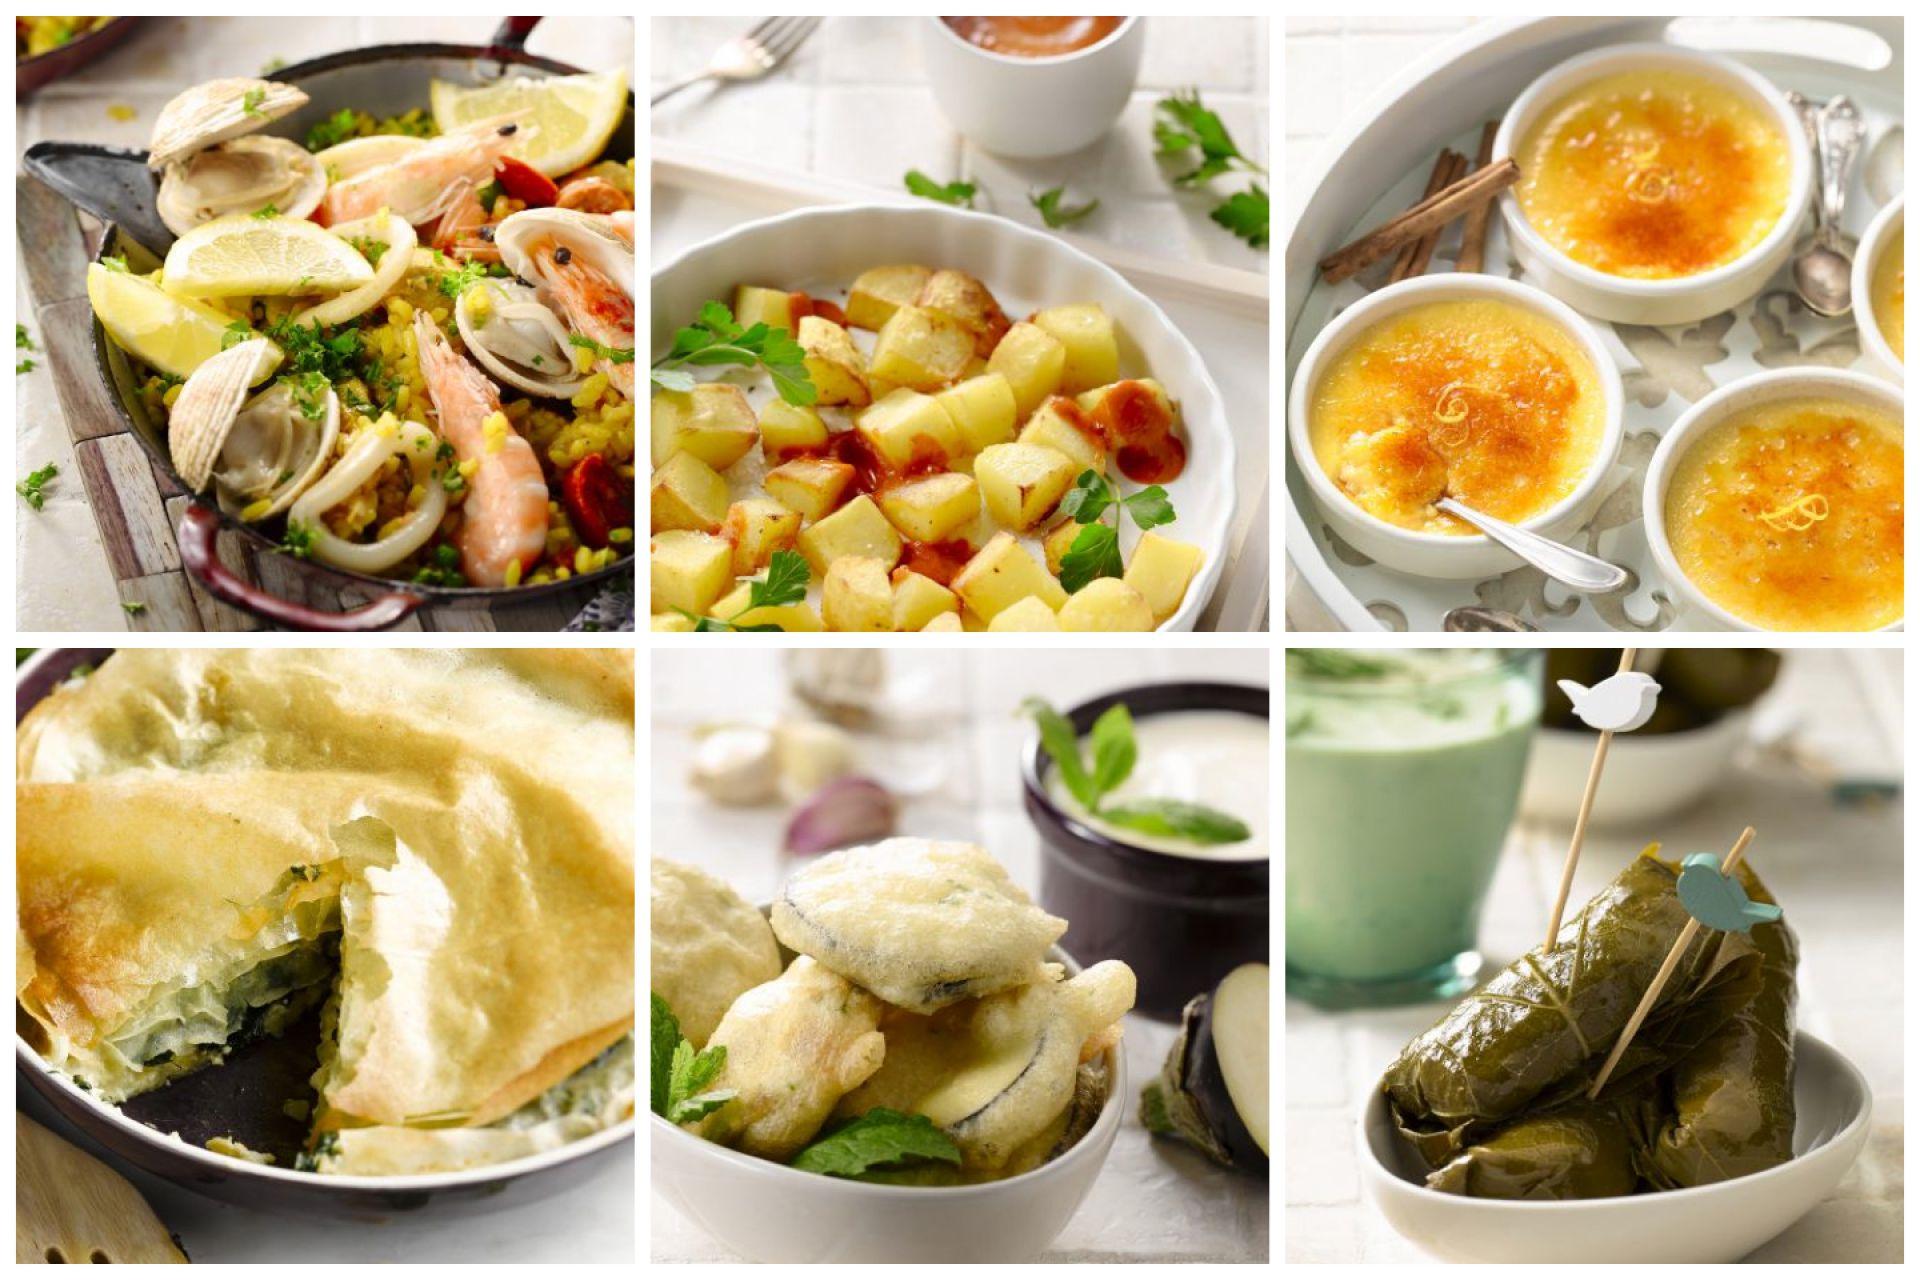 Griekse moussaka vs spaanse paella een zomers dilemma keukenpraat 15gram - Eilandjes van keuken ...